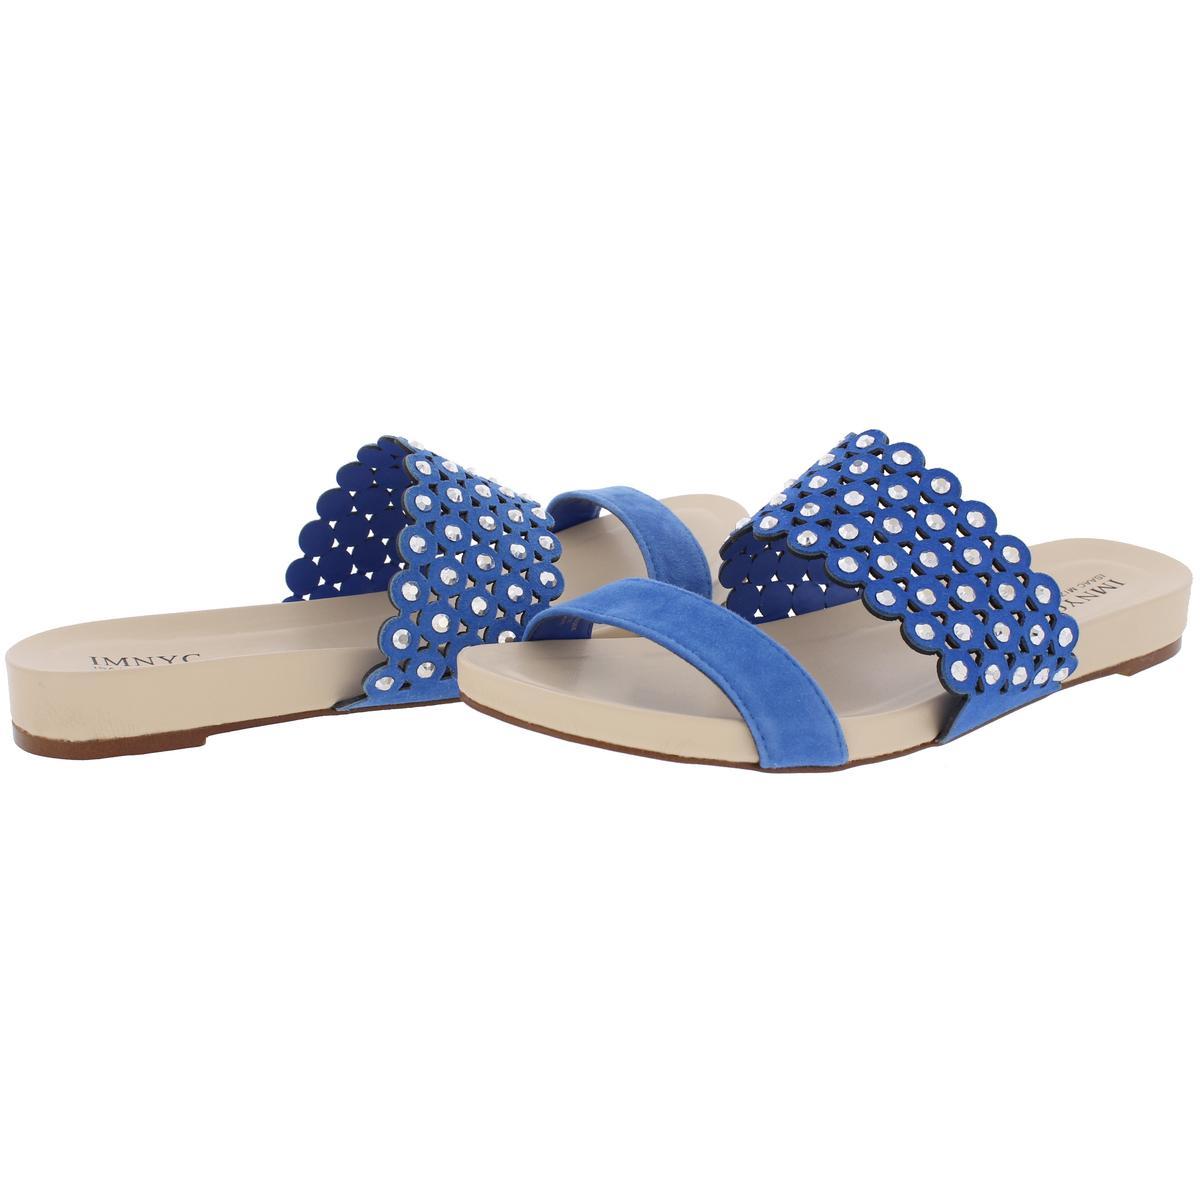 IMNYC-Isaac-Mizrahi-Womens-Suzie-Open-Toe-Studded-Slide-Sandals-Shoes-BHFO-2715 thumbnail 6